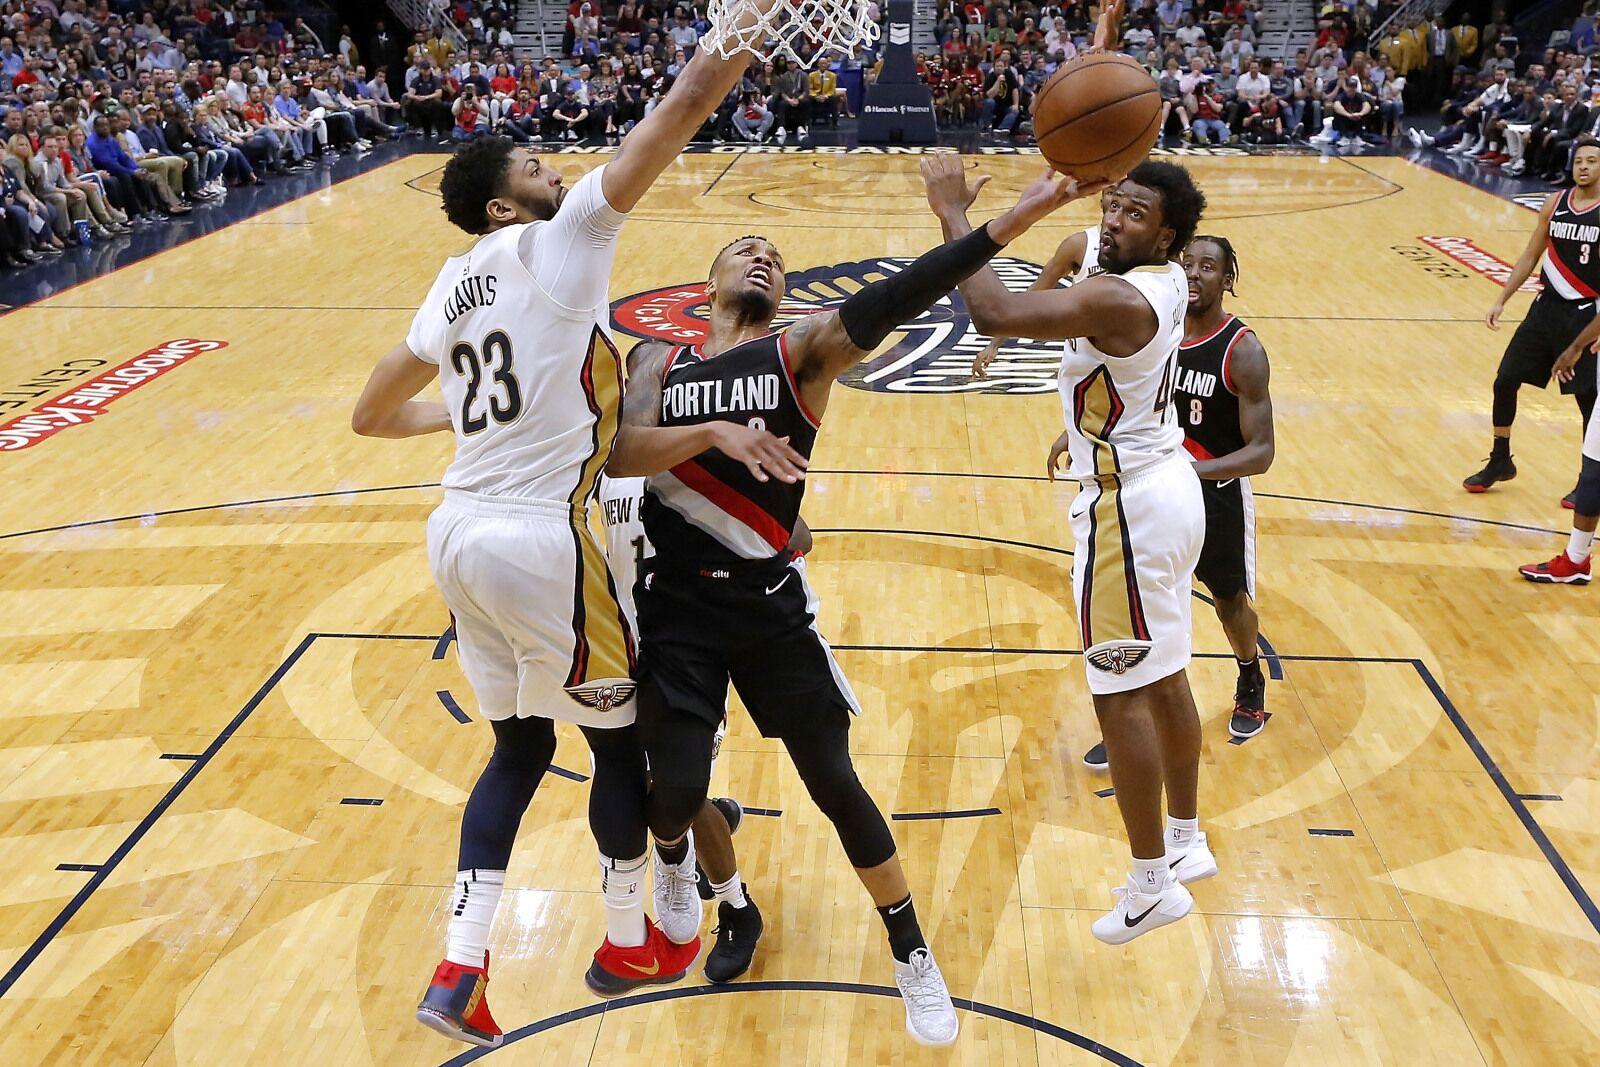 Pelicans Vs Trail Blazers Detail: 2018 NBA Playoffs: Trail Blazers Vs. New Orleans Pelicans